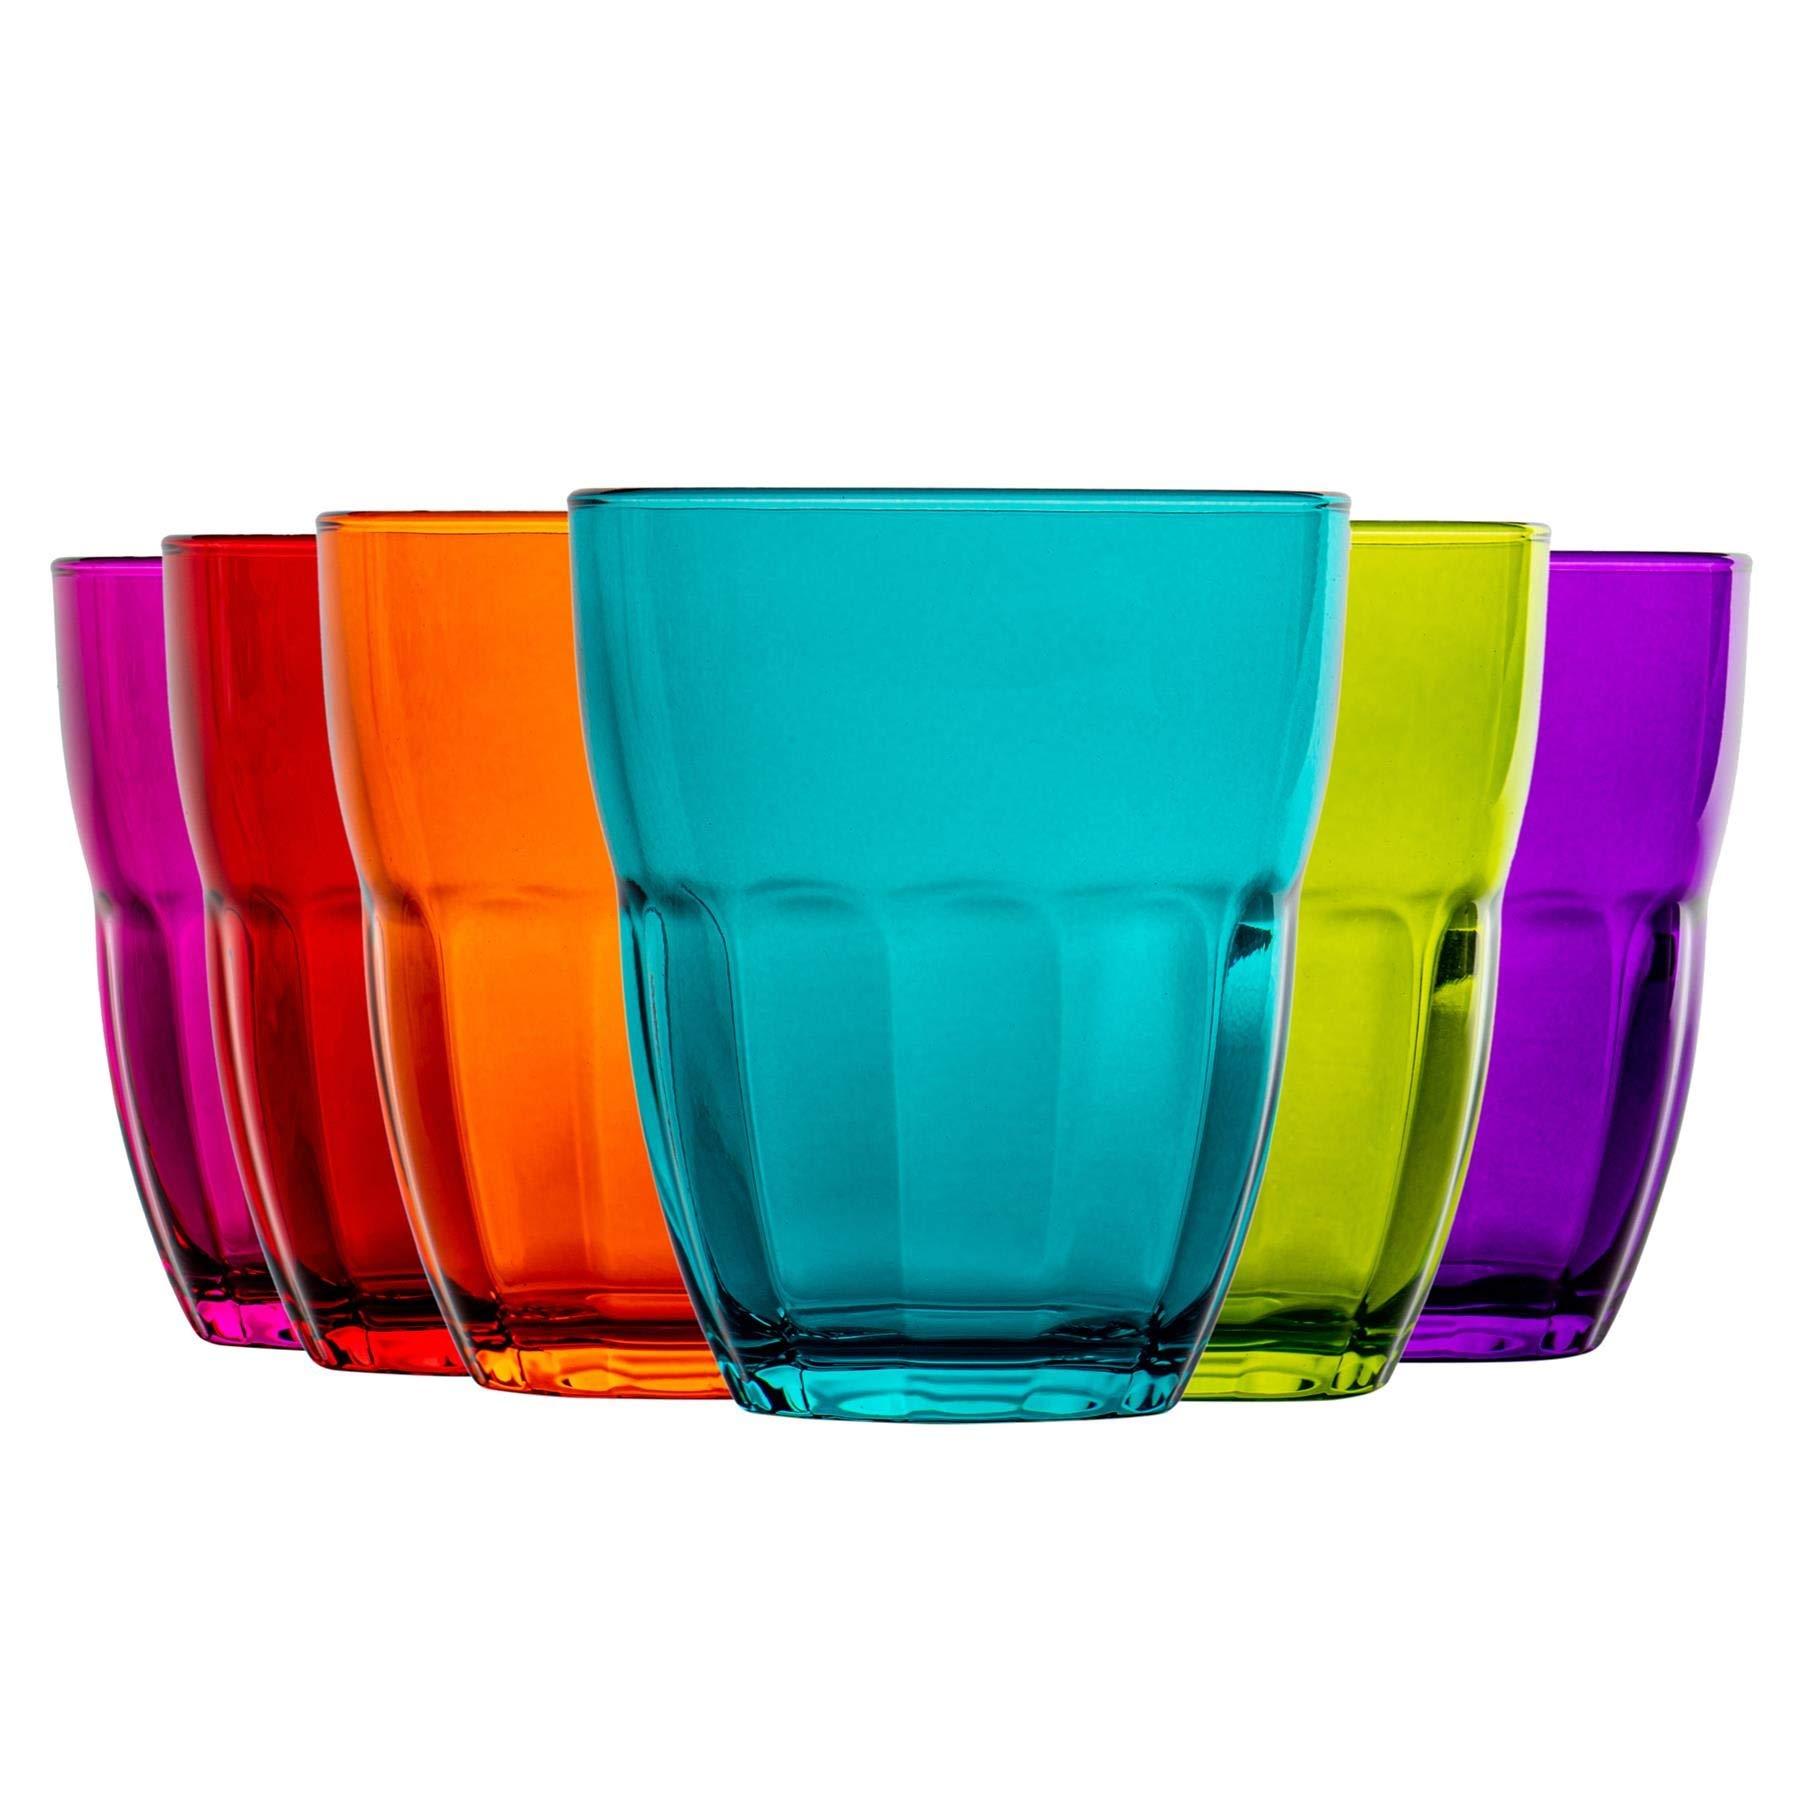 Bormioli Rocco Ercole Coloured Tumbler Glasses - 230ml - Multi Coloured - Set of 6